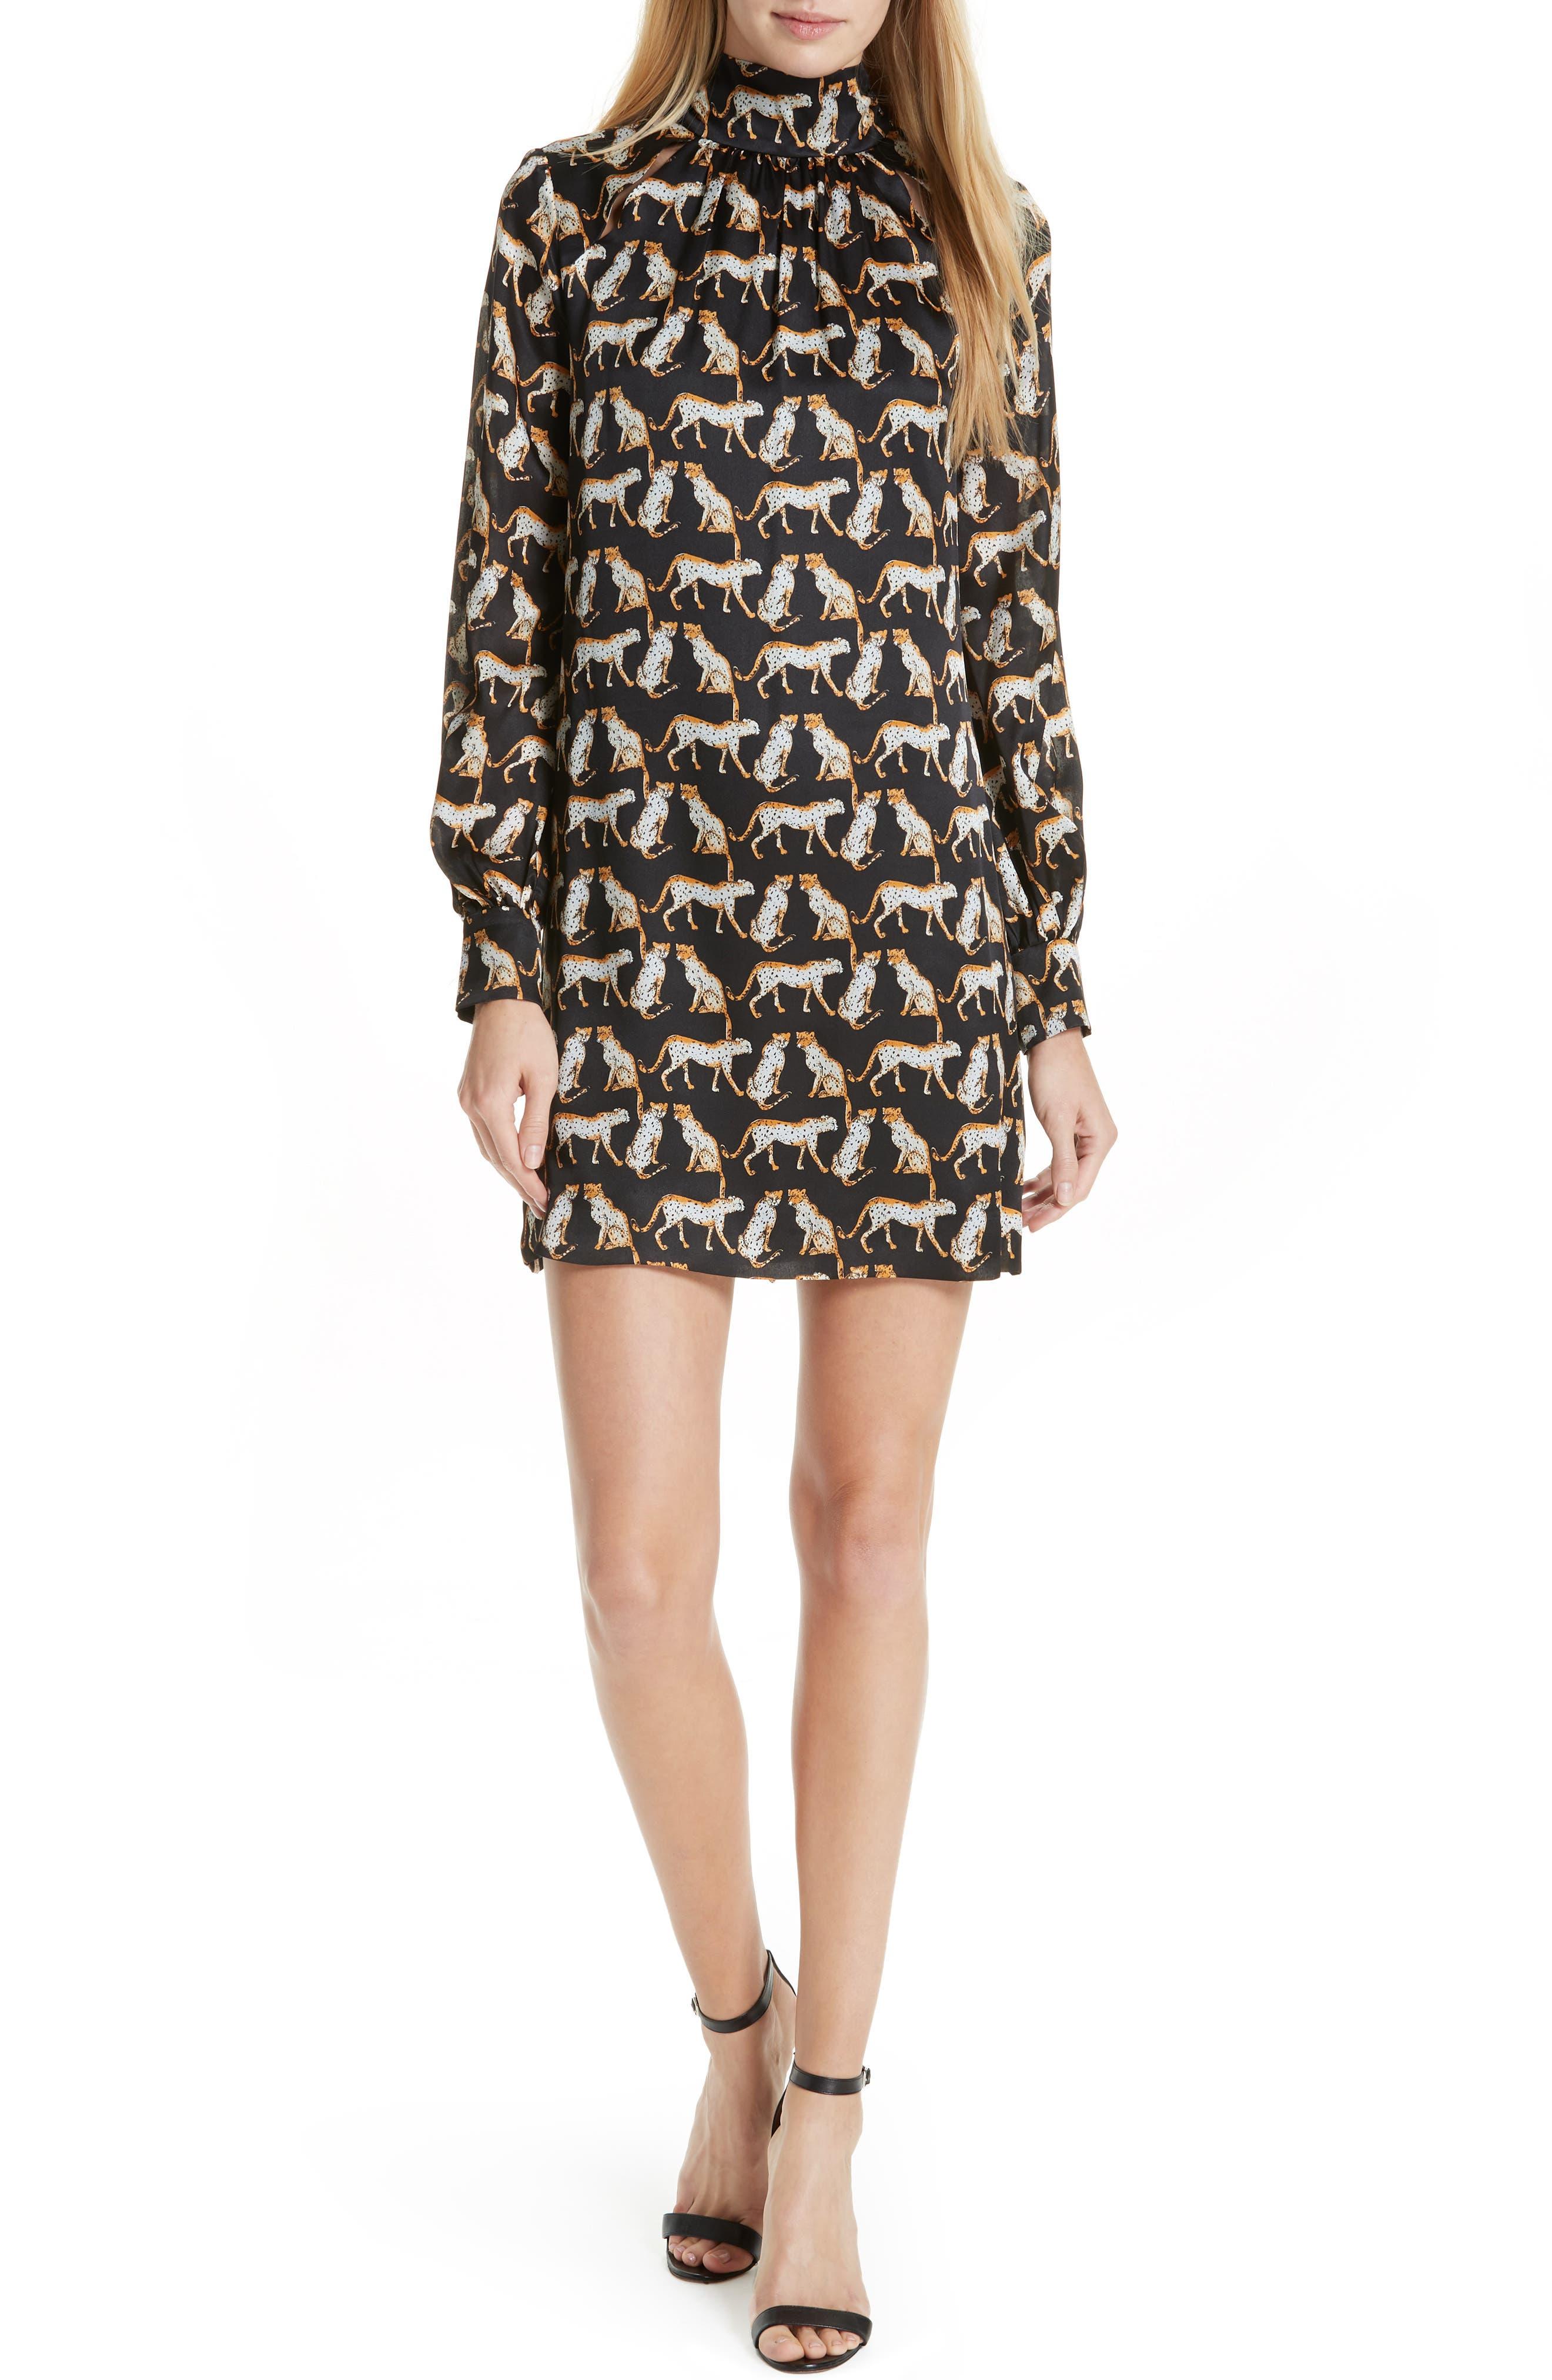 MILLY,                             Cheetah Print High Neck Silk Dress,                             Main thumbnail 1, color,                             001